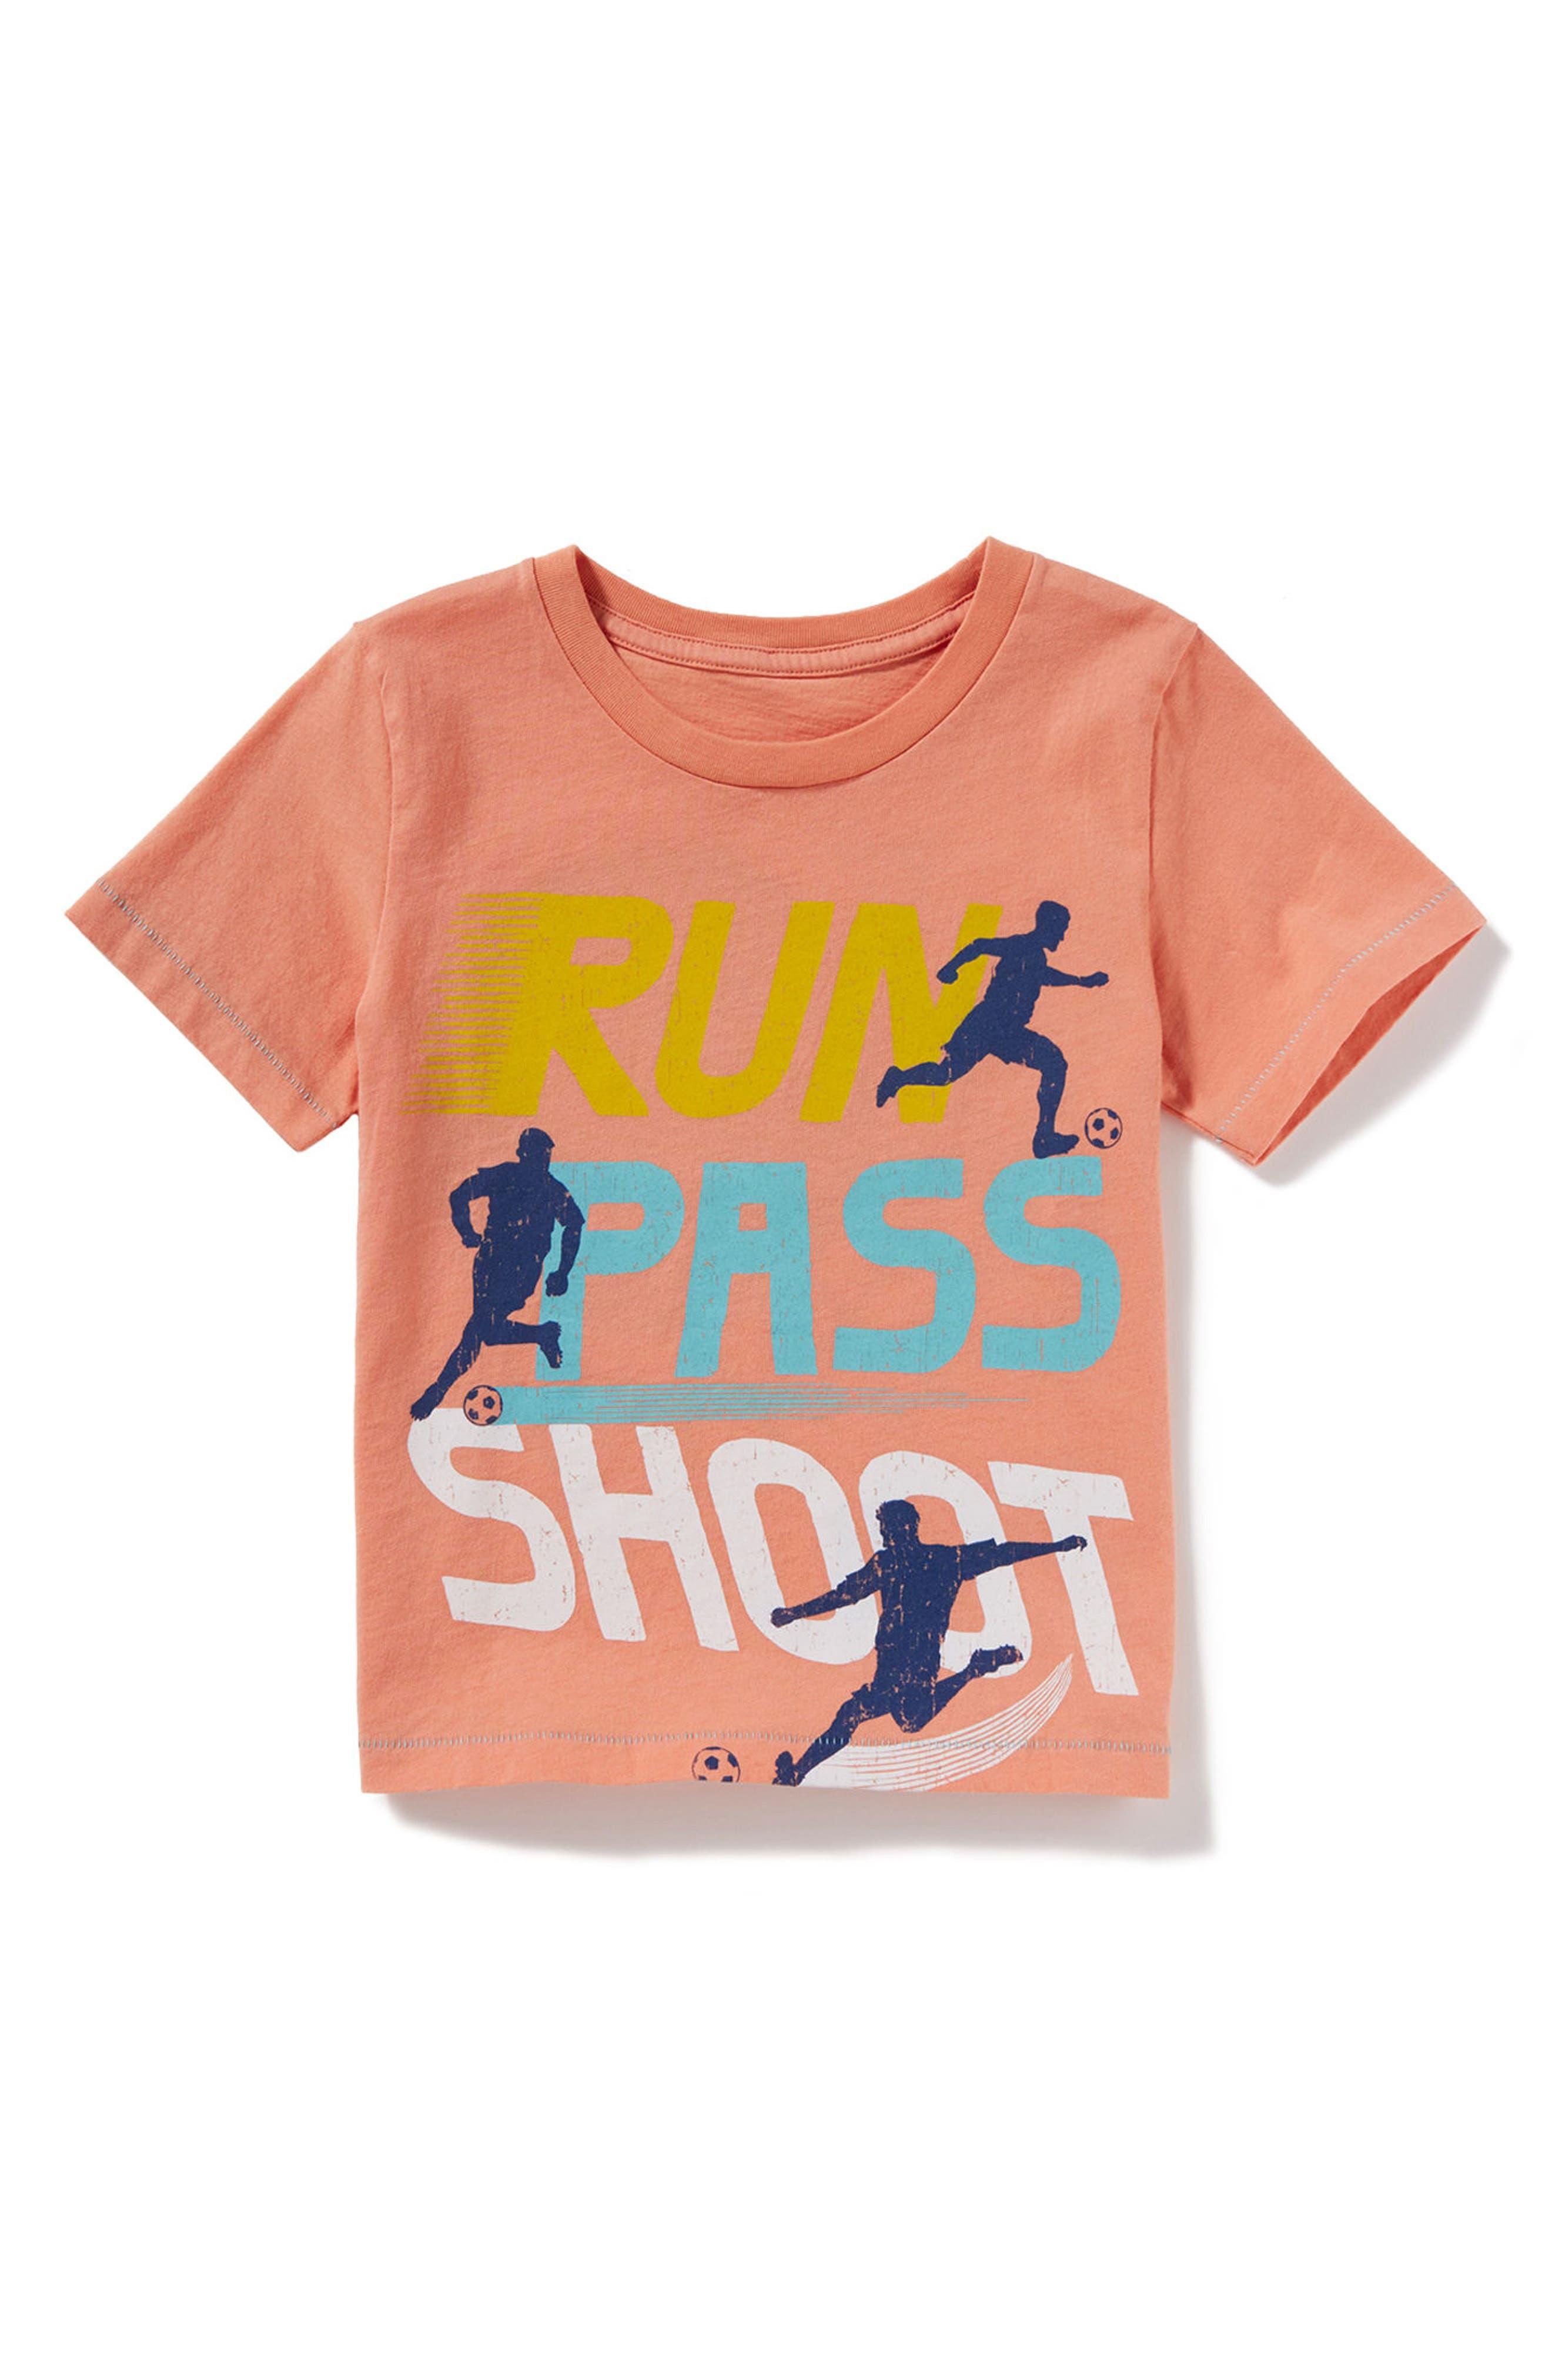 Peek Run Pass Shoot Graphic T-Shirt (Toddler Boys, Little Boys & Big Boys)